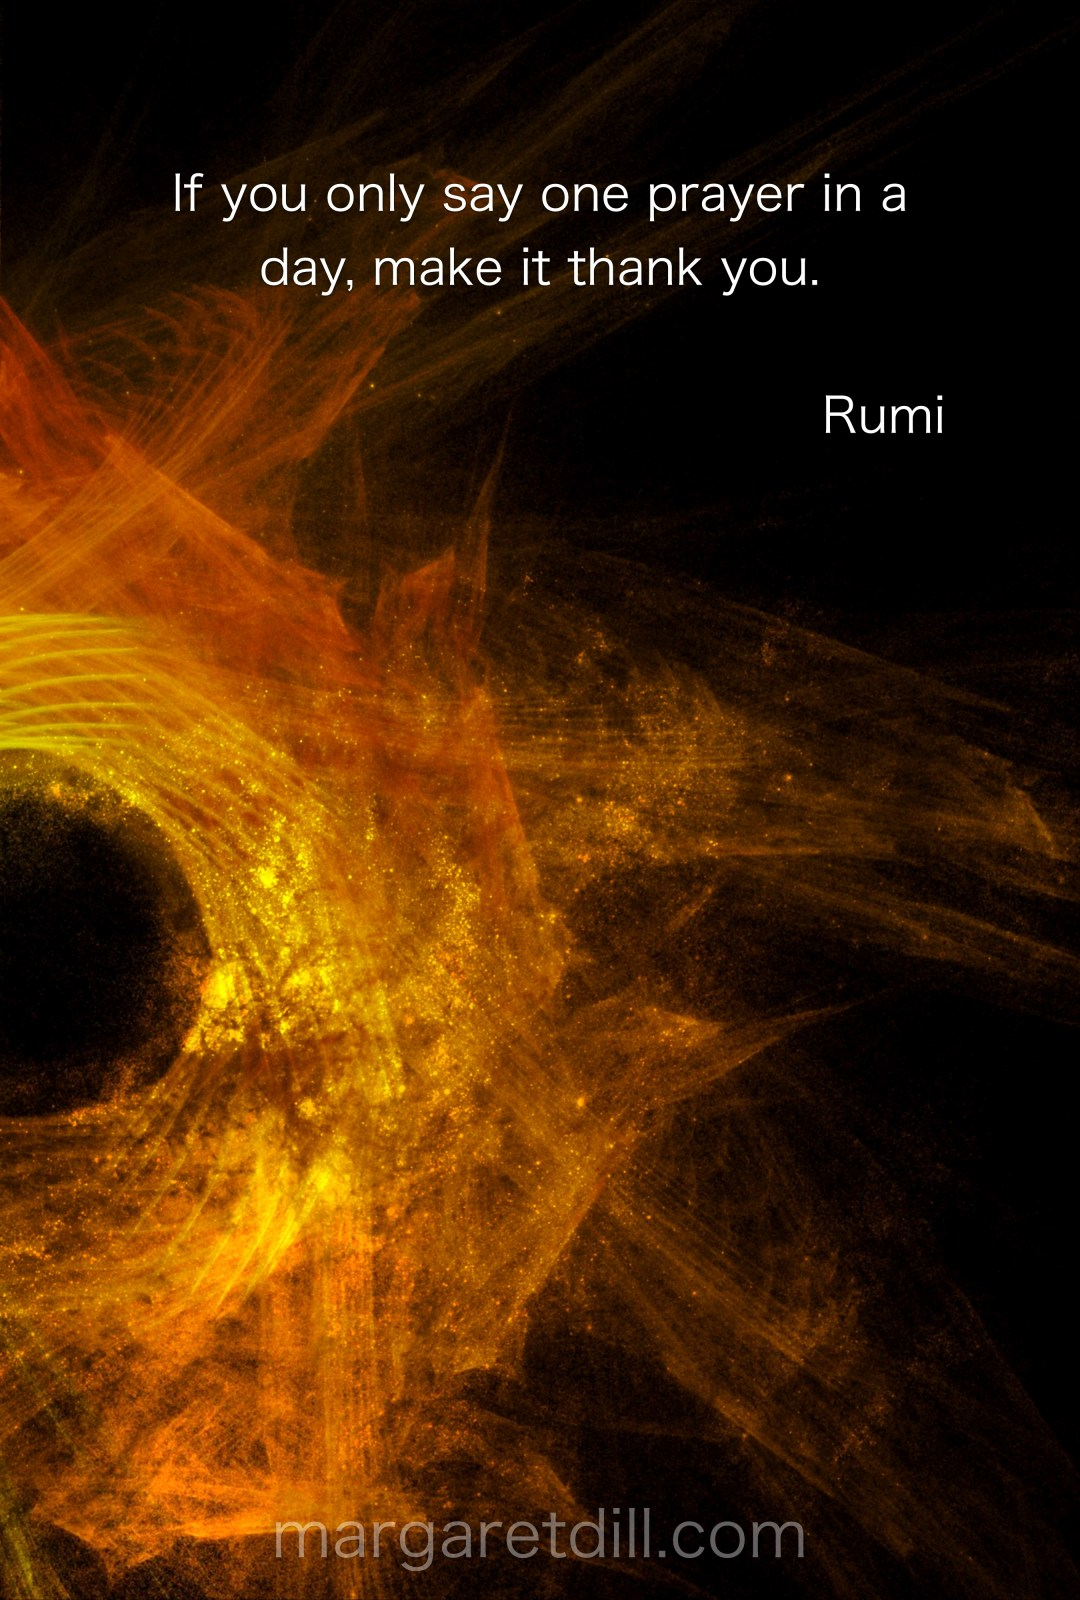 If you only say one prayer Rumi Quote  #wordstoliveby #mindfulness #meditation #Spiritualawakening #wordsofwisdom #quotations #rumi #rumiquotes